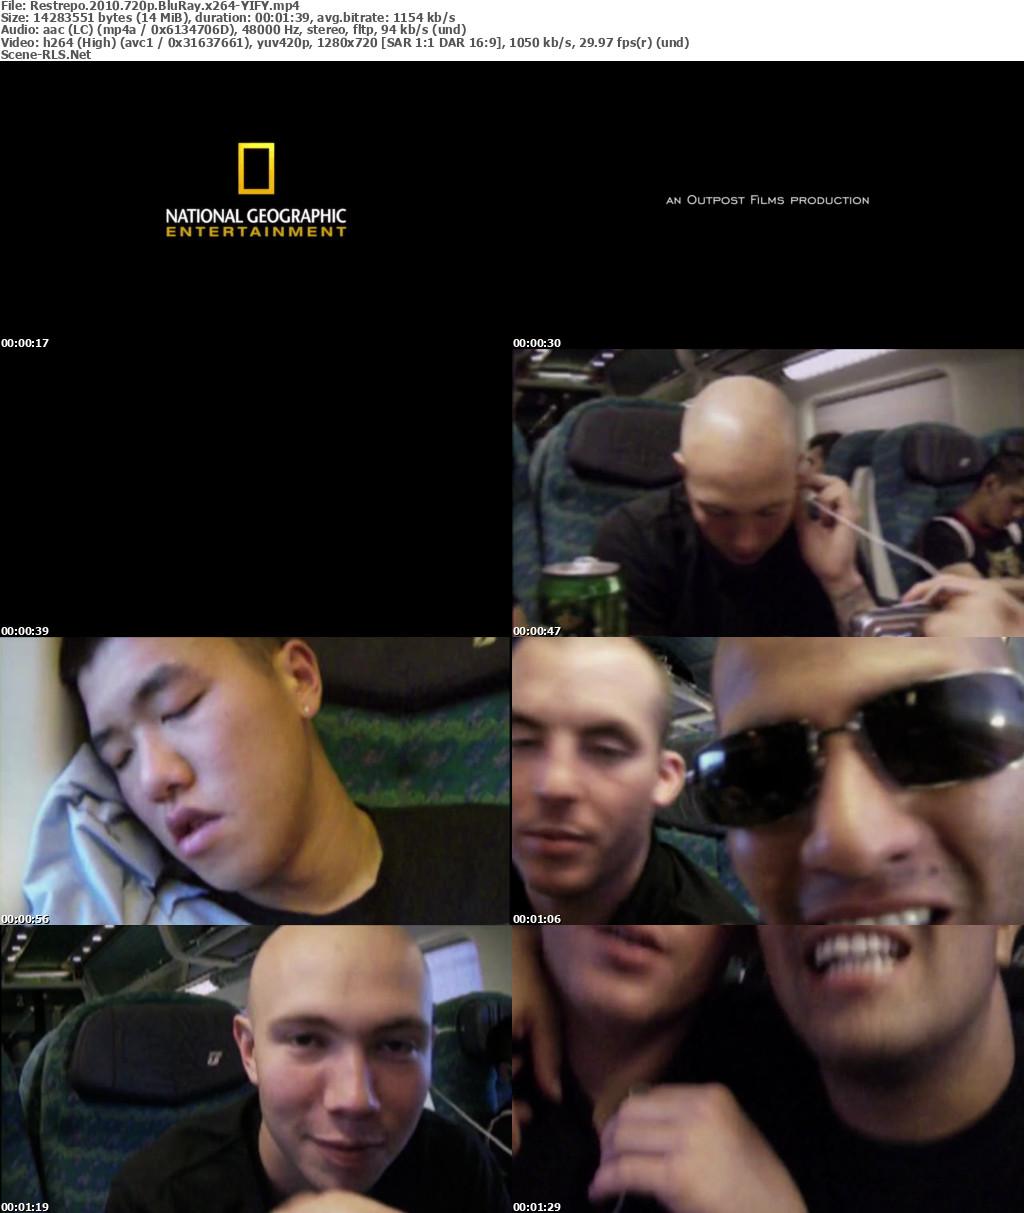 Restrepo 2010 720p BluRay x264-YIFY - Scene Release